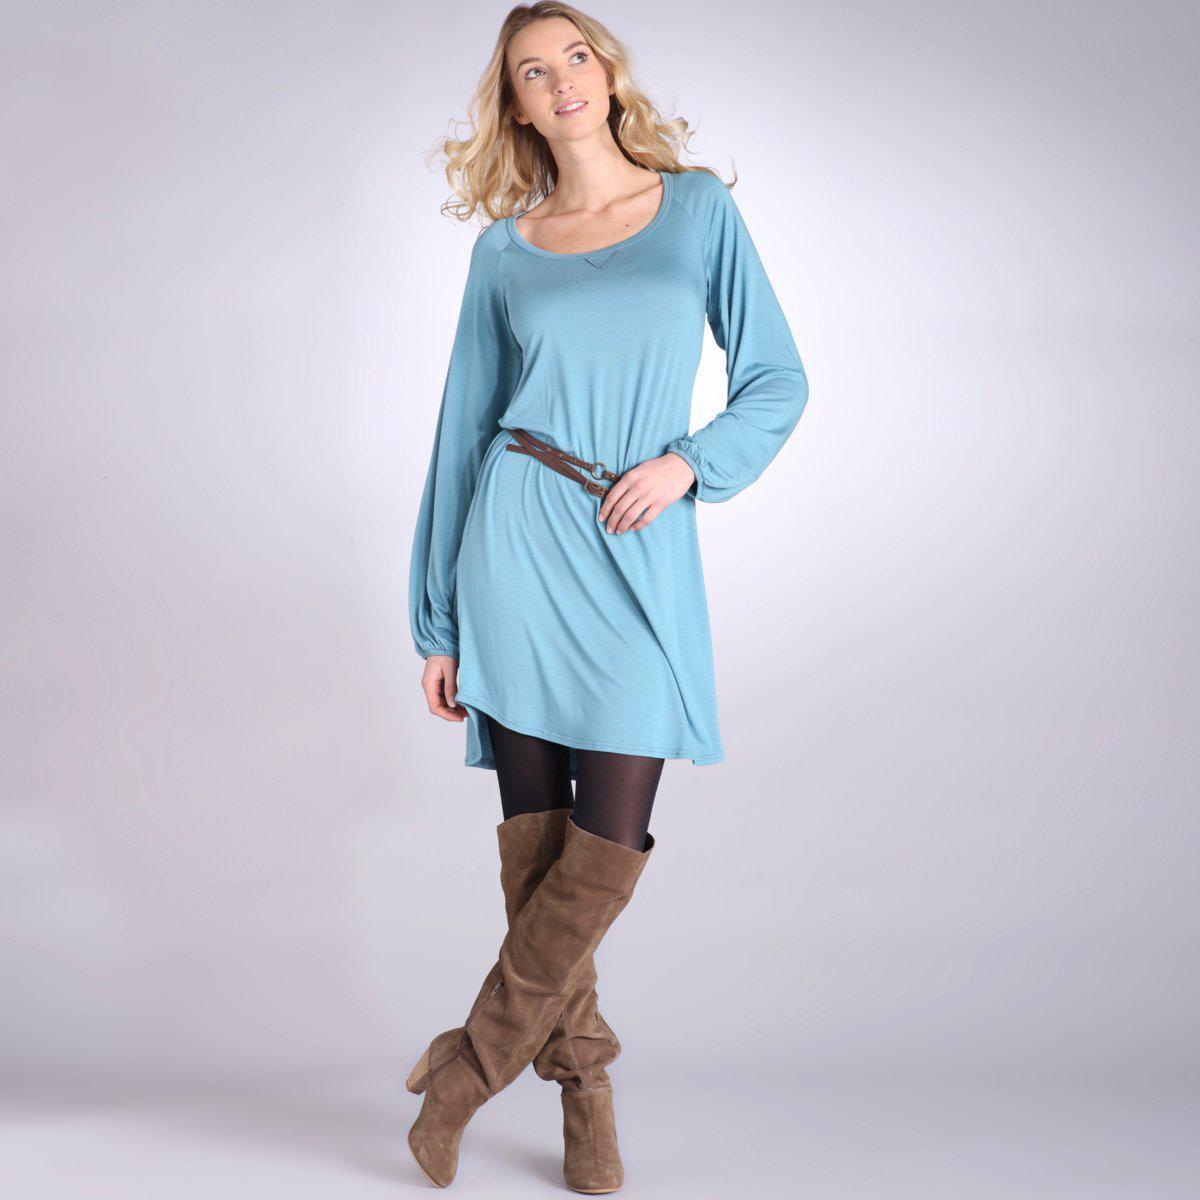 bradyna foremata 275 - Βραδυνα Φορεματα LaRedoute Χειμώνας 2012 Κωδ. 324205491